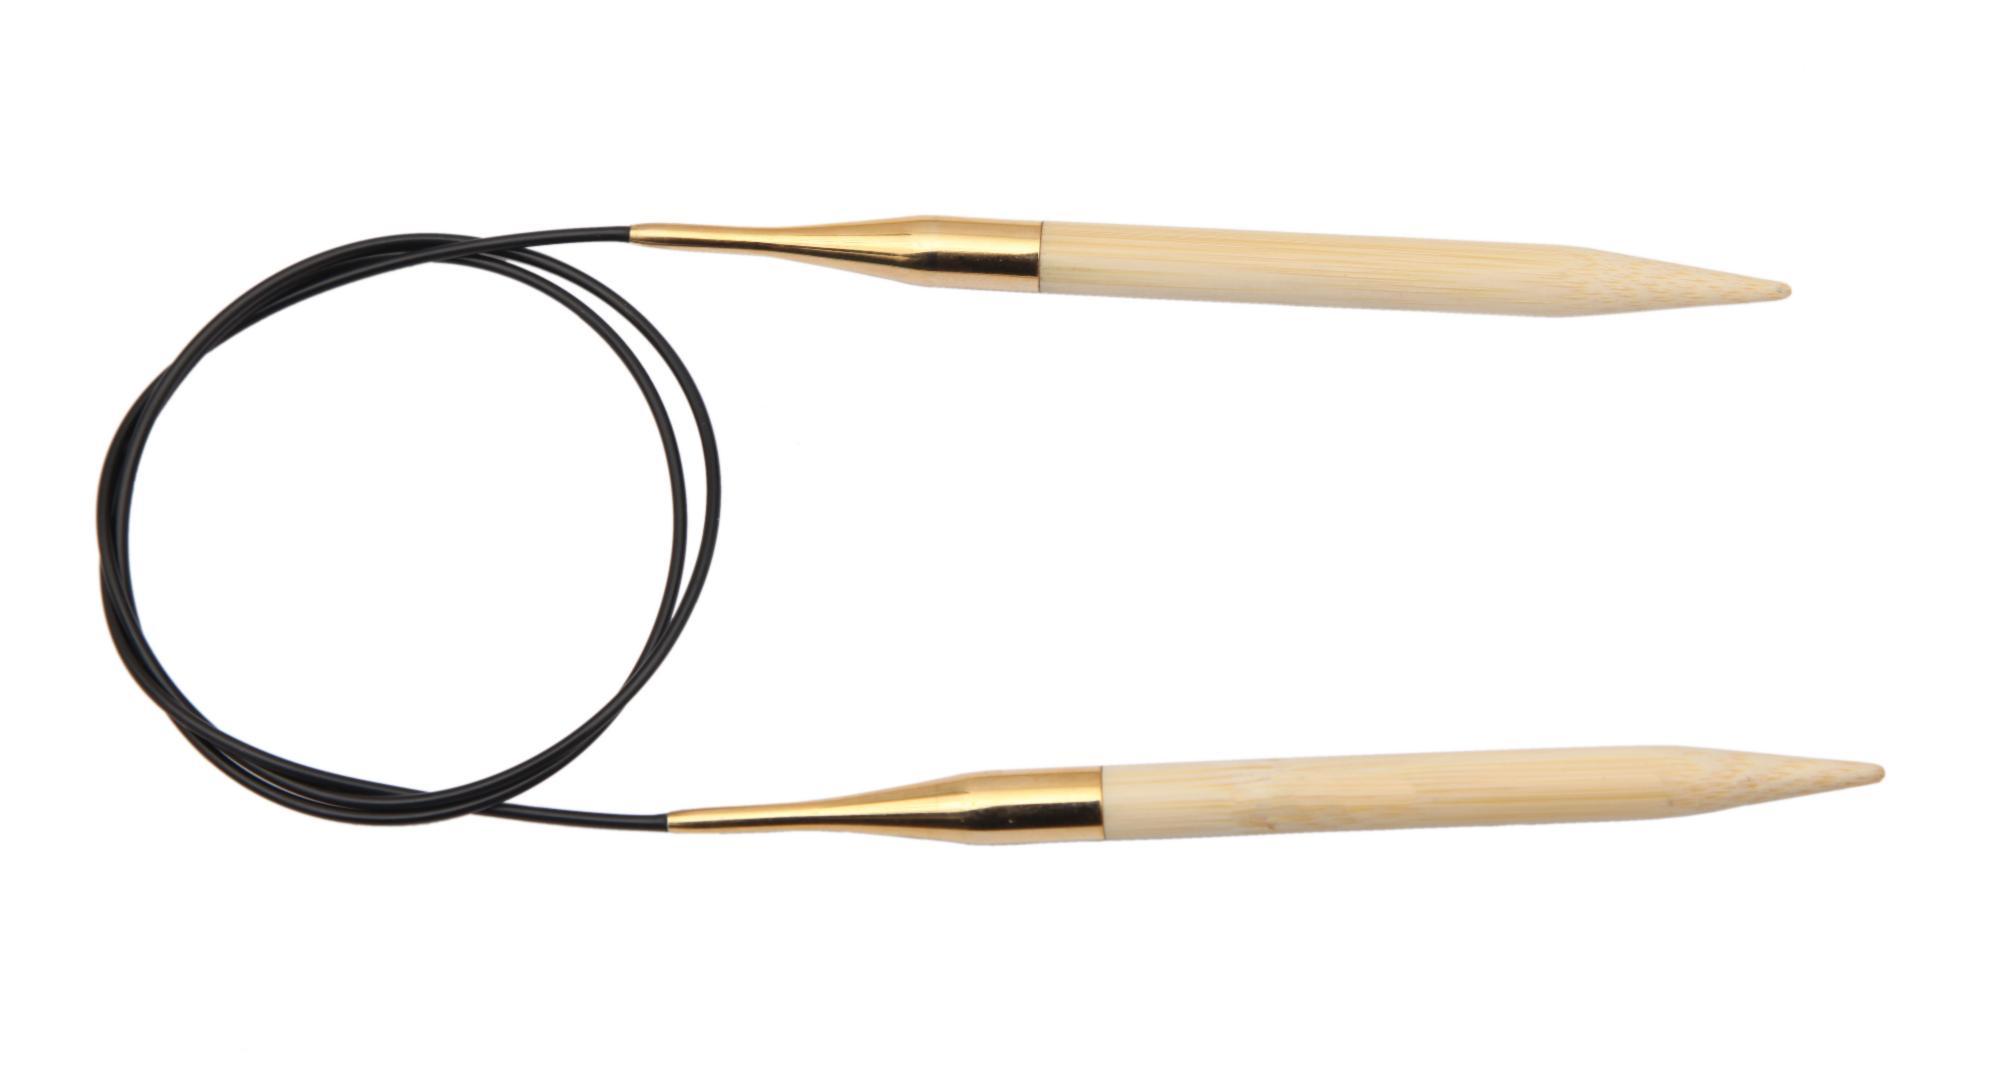 Спицы круговые 80 см Bamboo KnitPro, 22257, 3.25 мм